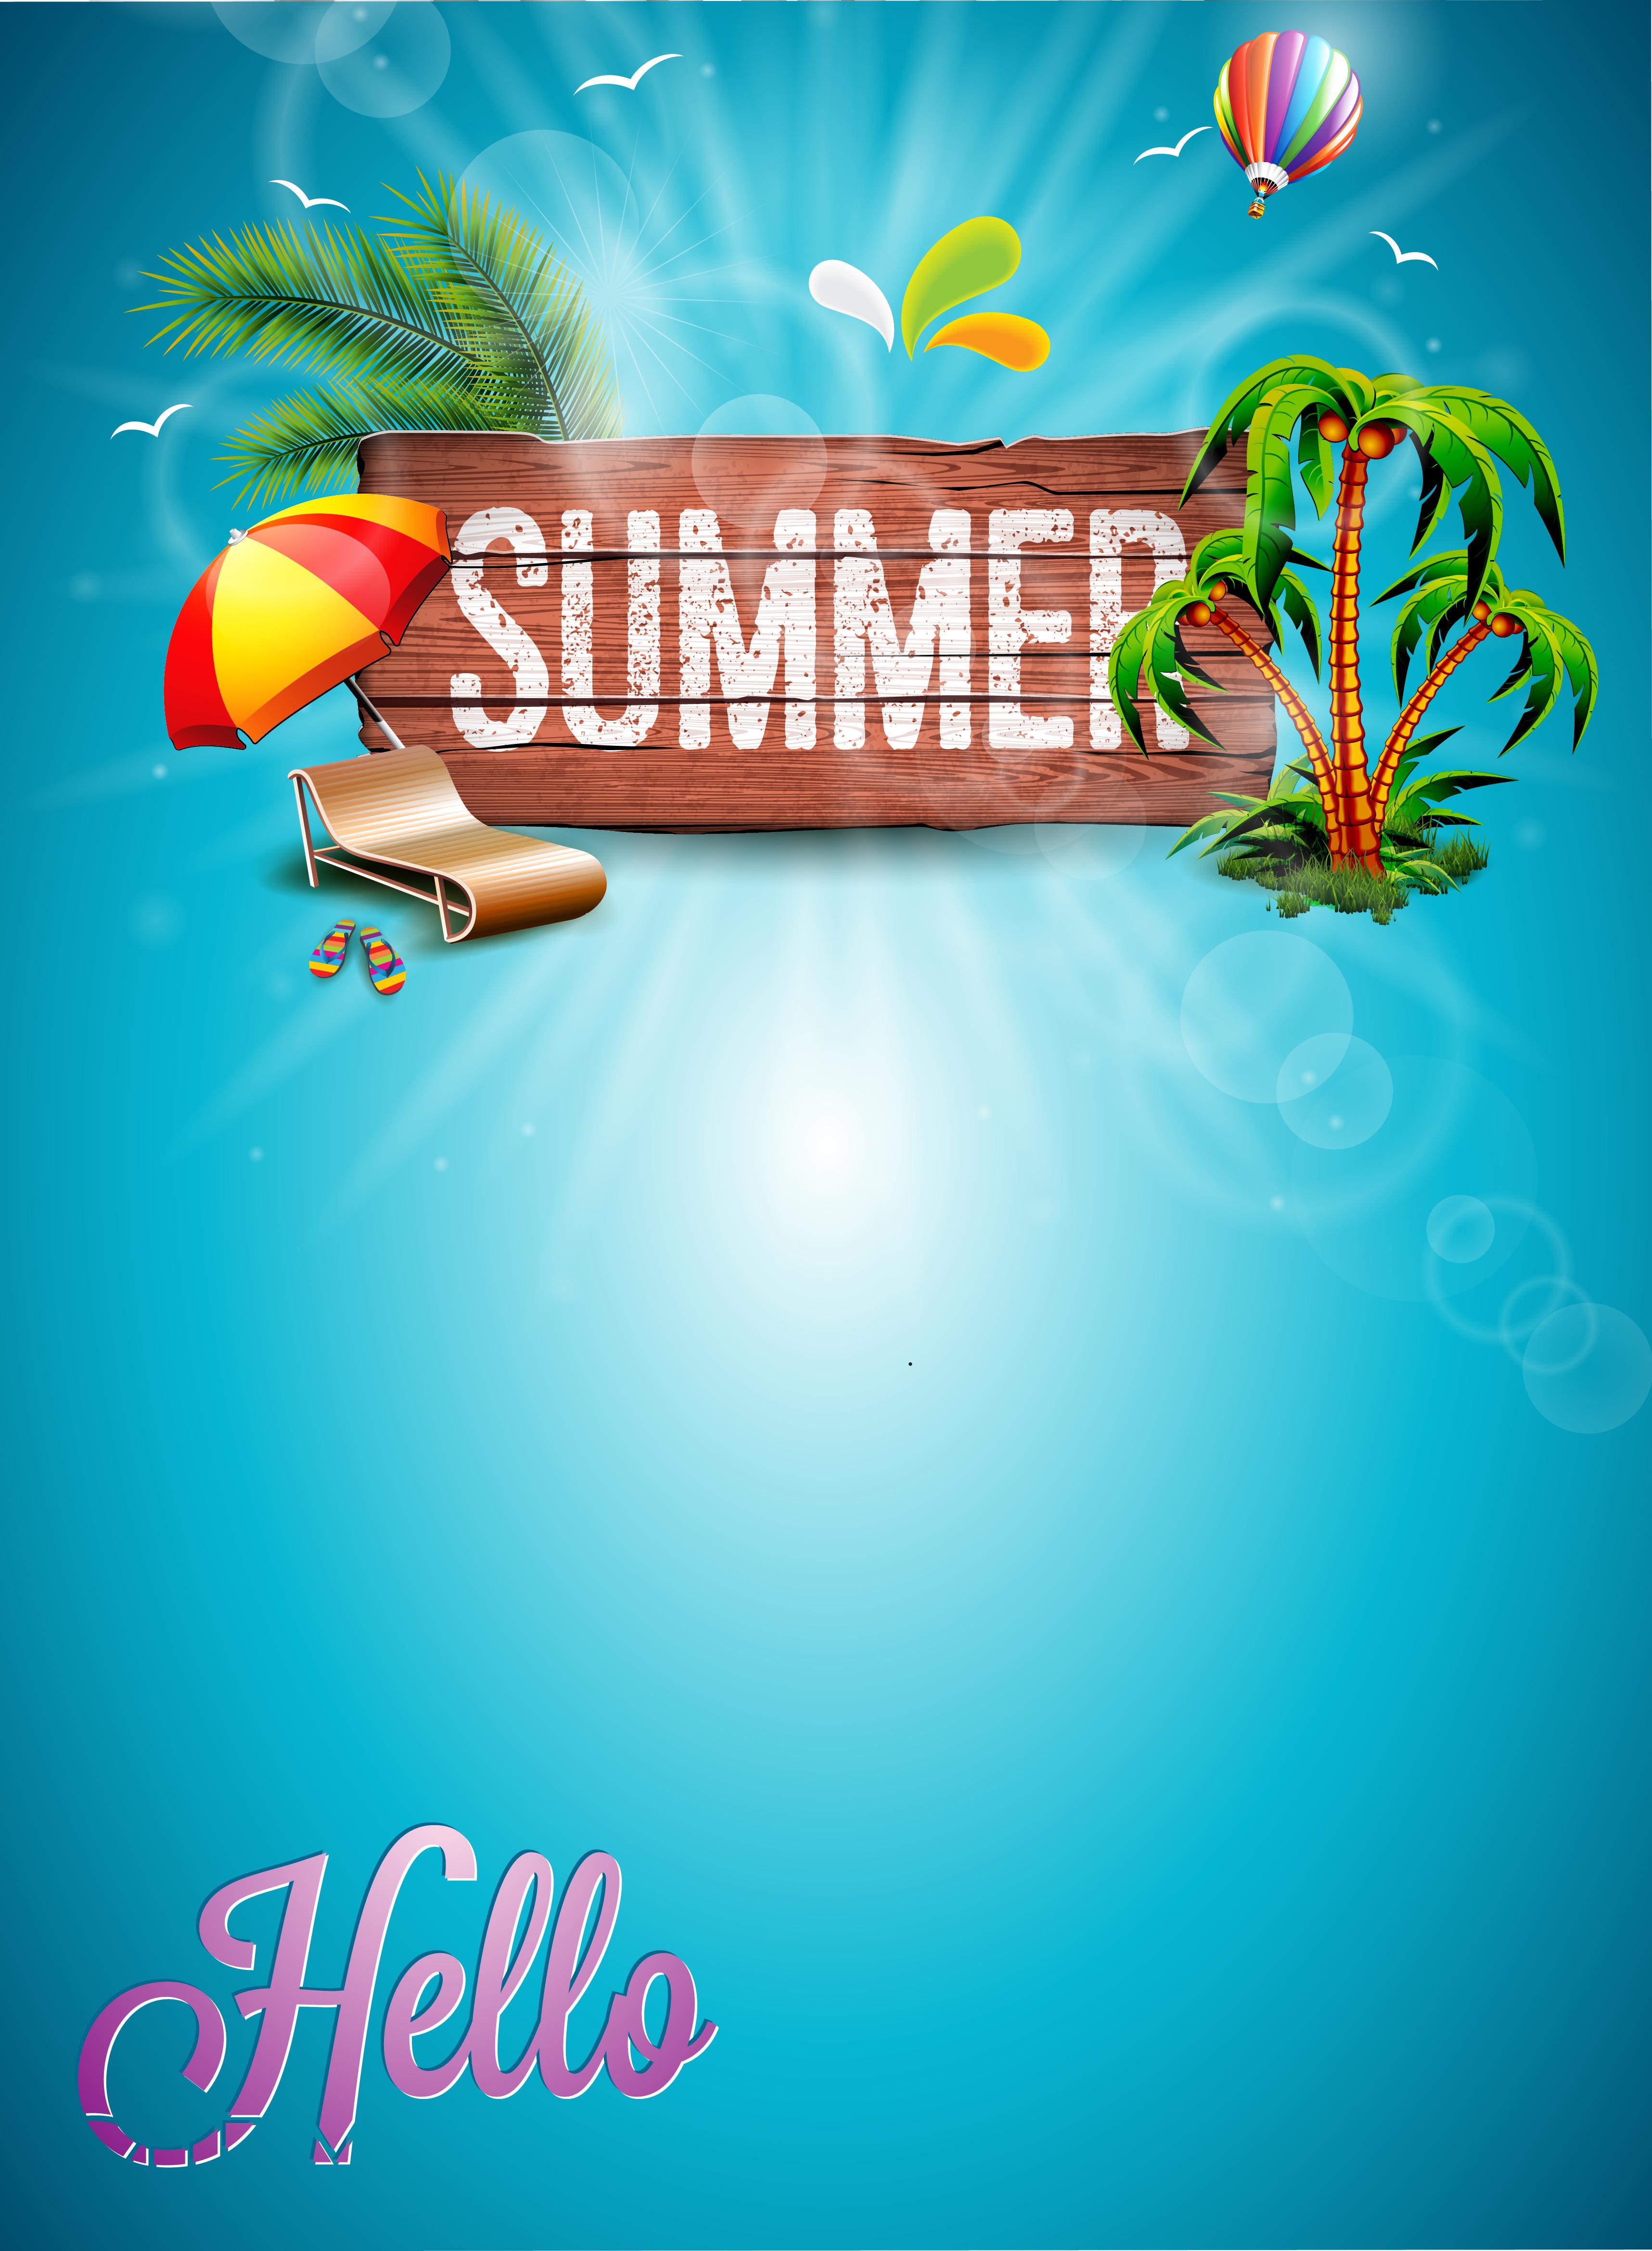 la madera de verano fondo titulo del cartel azul verano